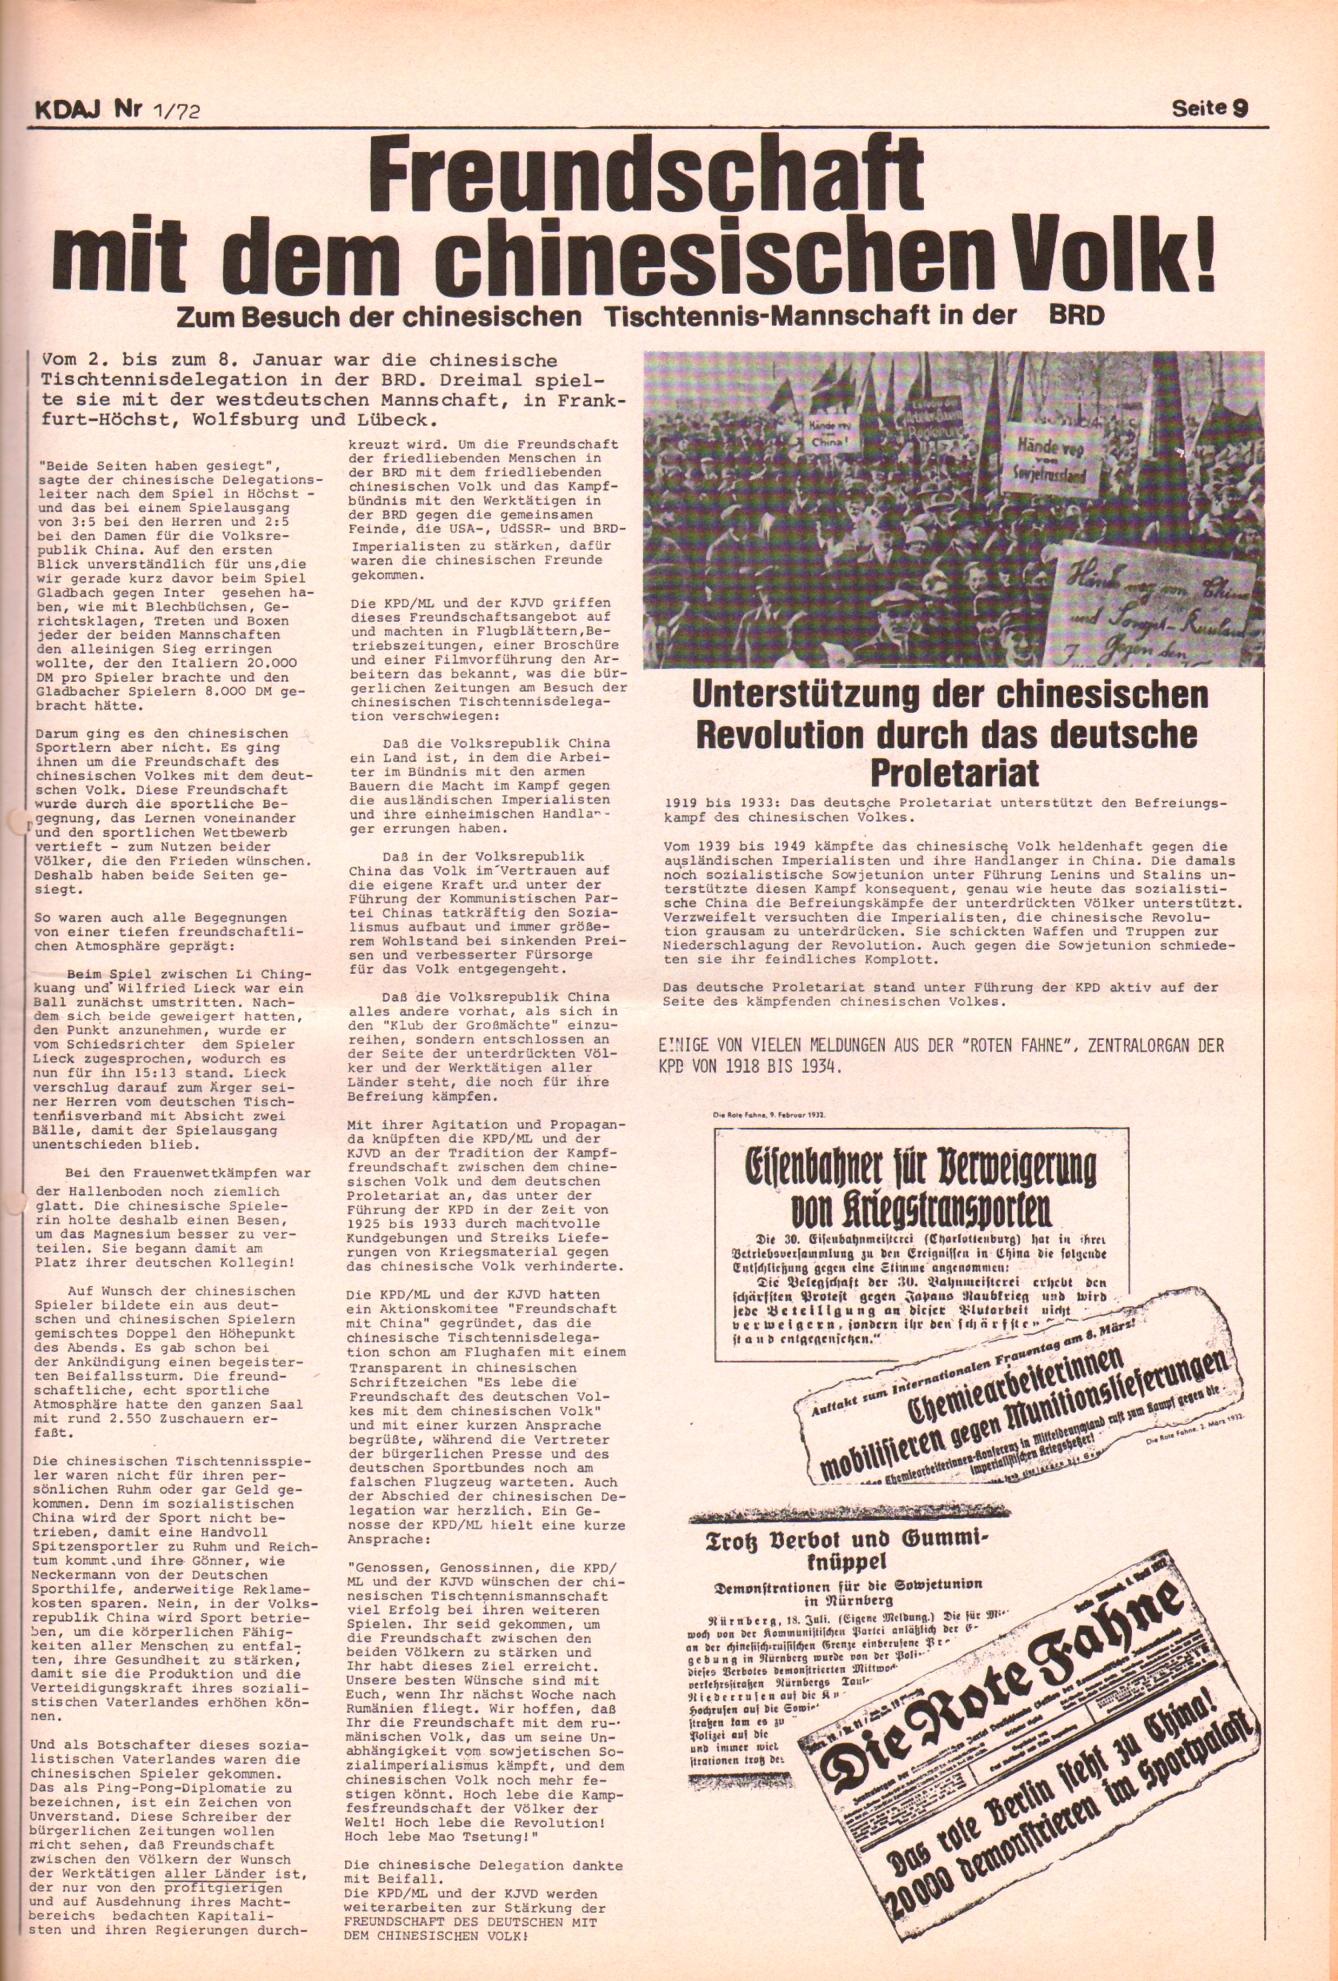 KDAJ, 3. Jg., Januar/Februar 1972, Nr. 1, Seite 9